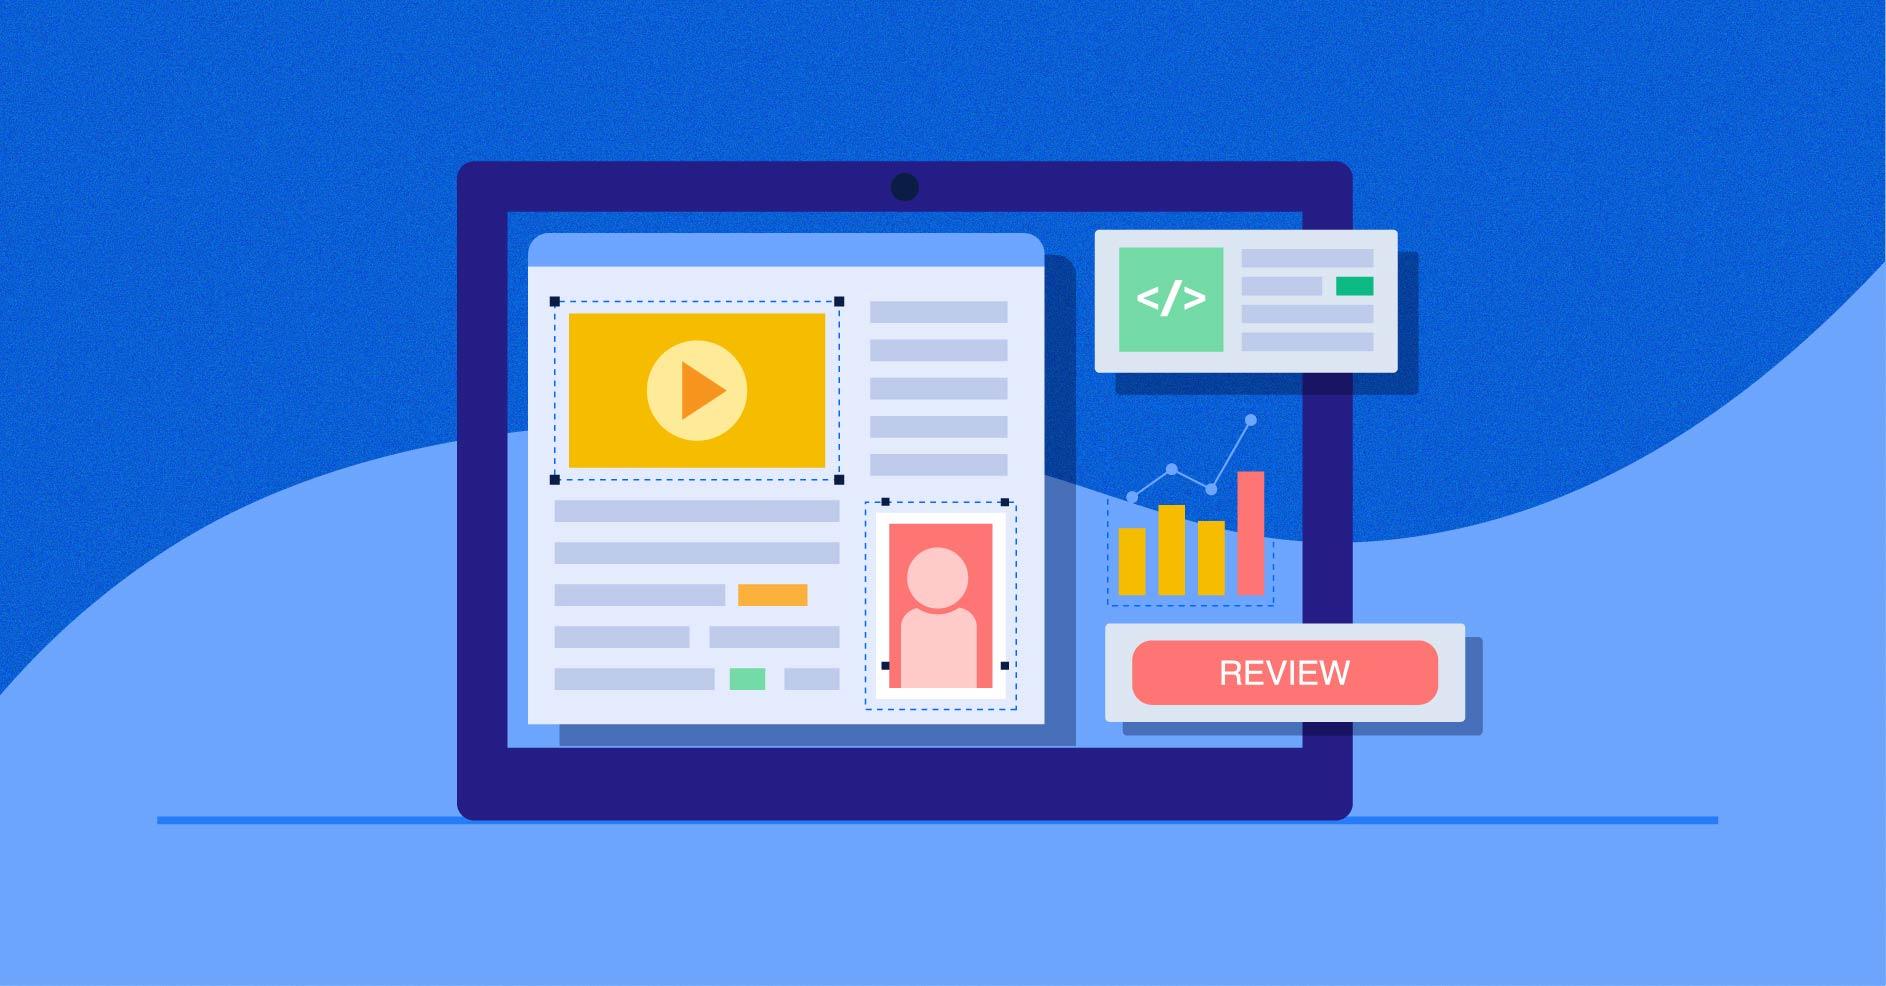 https://spotme.com/wp-content/uploads/2020/12/Hero-2020-vFairs-Review-A-Virtual-Event-Software-Review.jpg